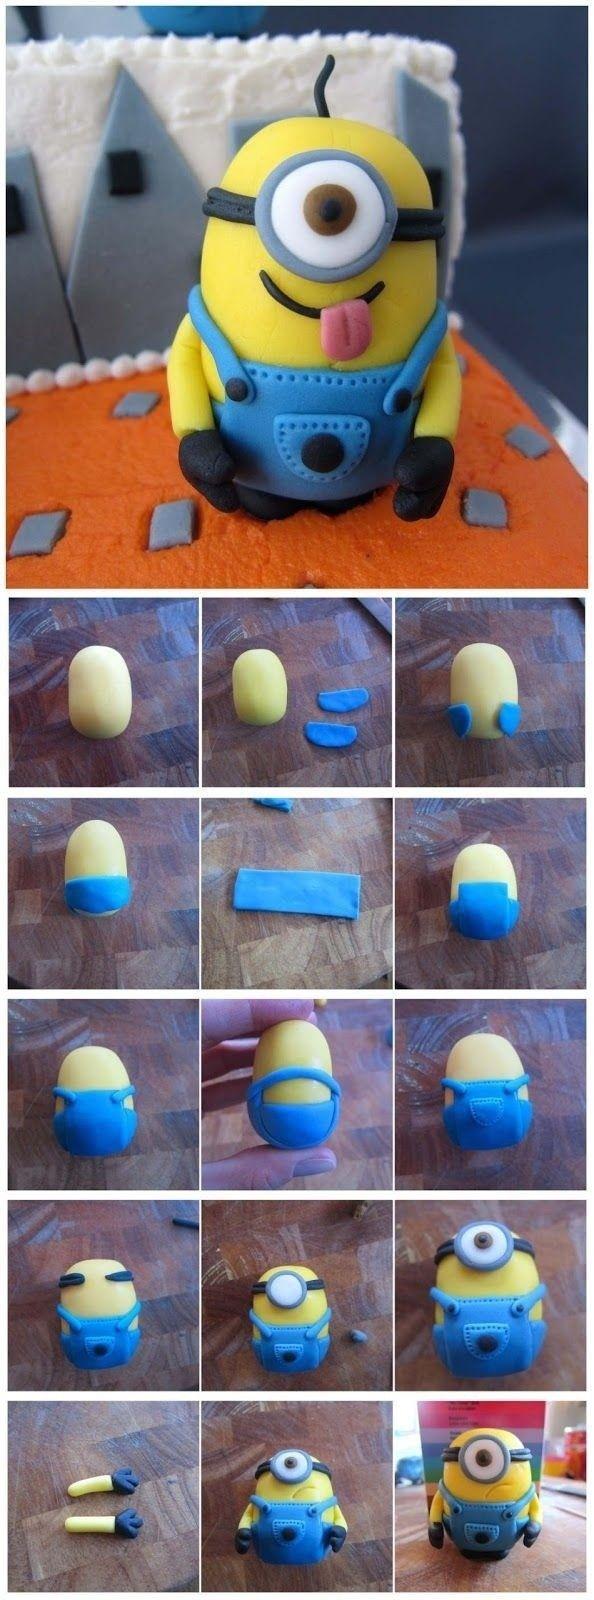 Cómo hacer un Minion de fondant / how to do a fondant Minion